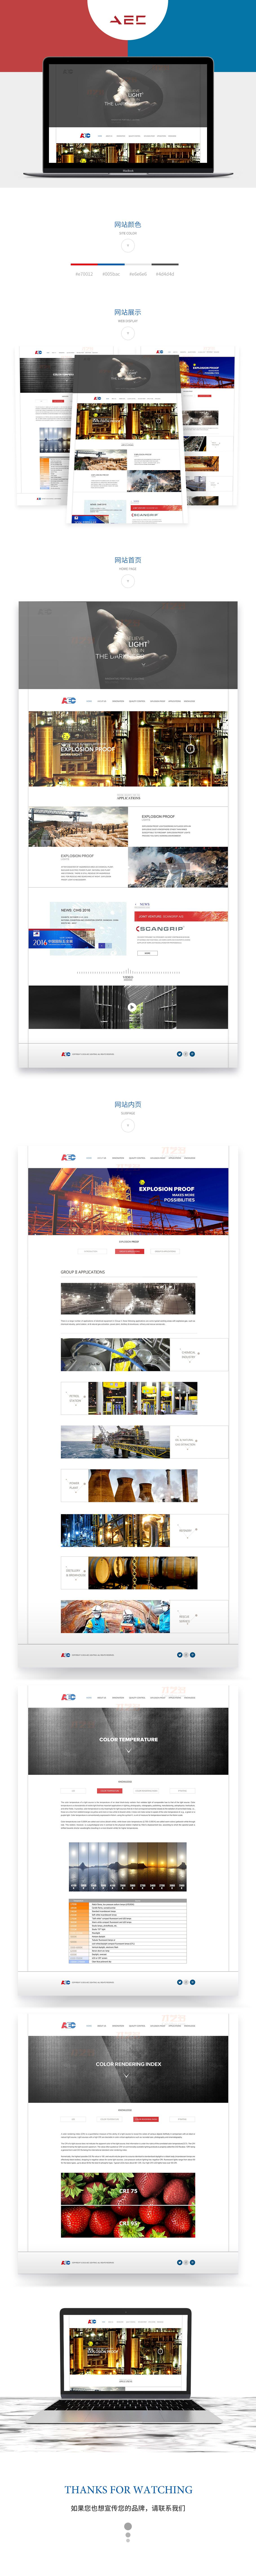 公司网站建设案例之AEC LED